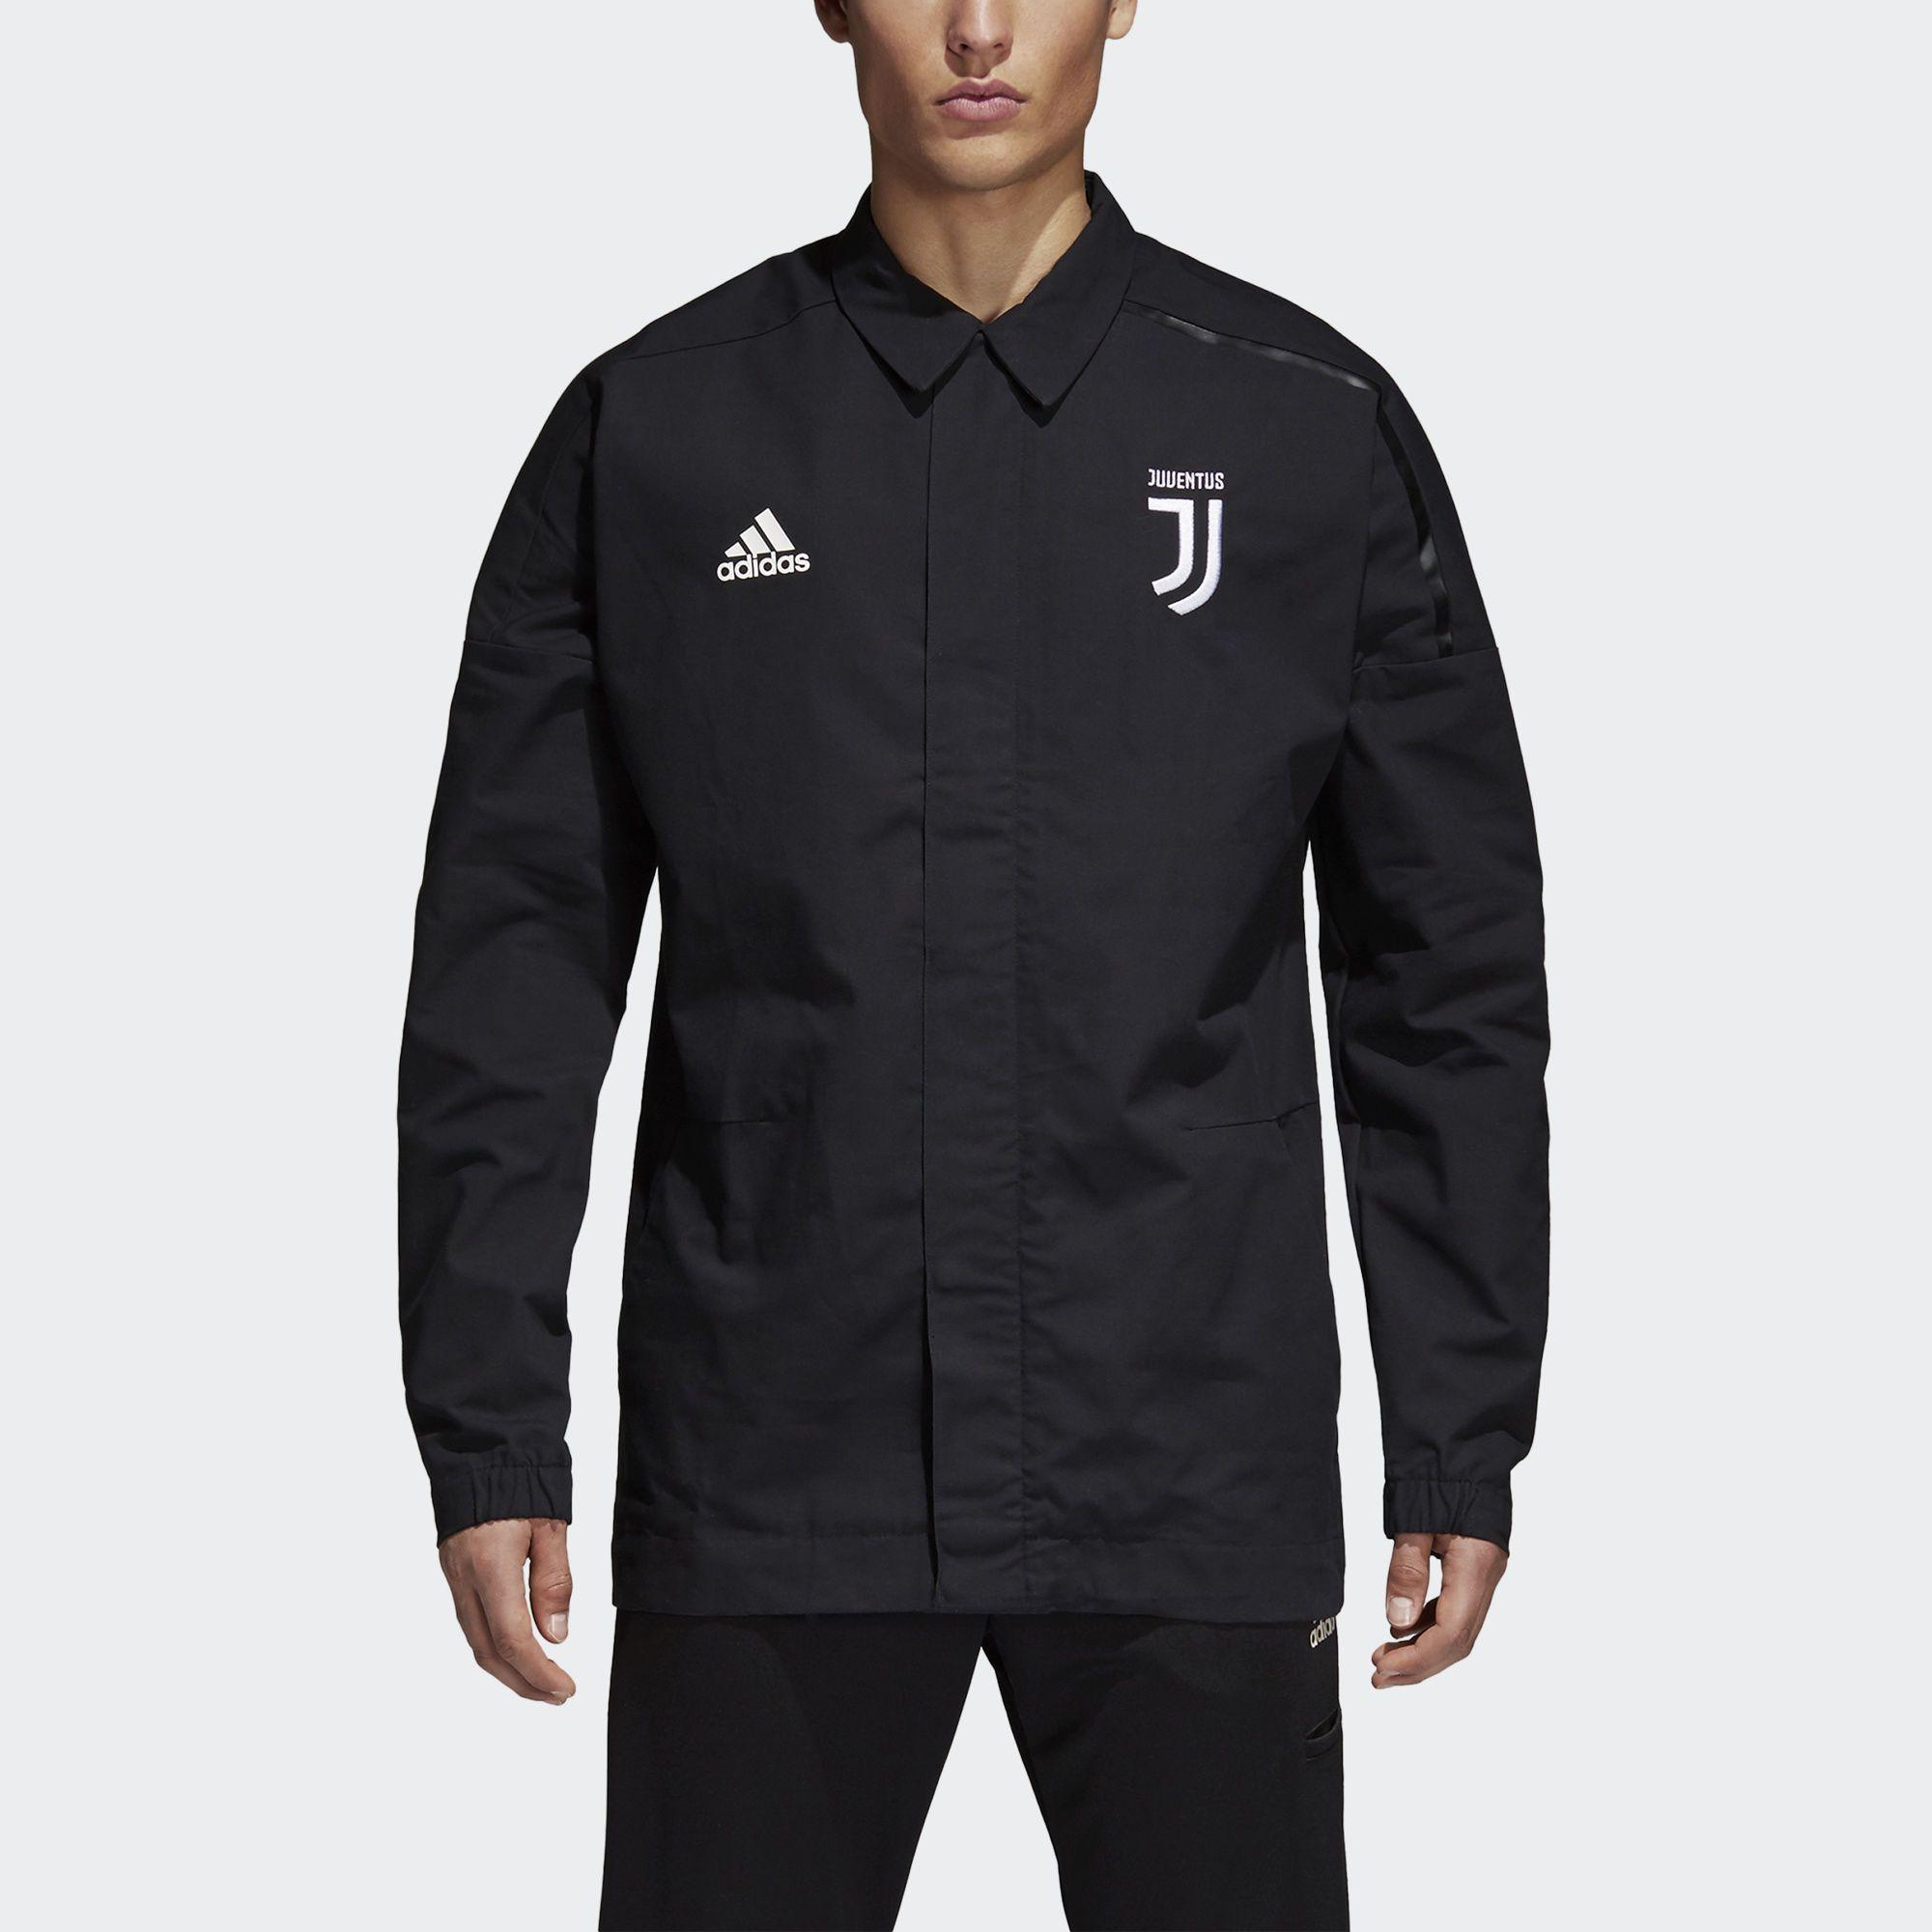 dd00855c7858fc Куртка Ювентус adidas Z.N.E. | Куртки | Куртка